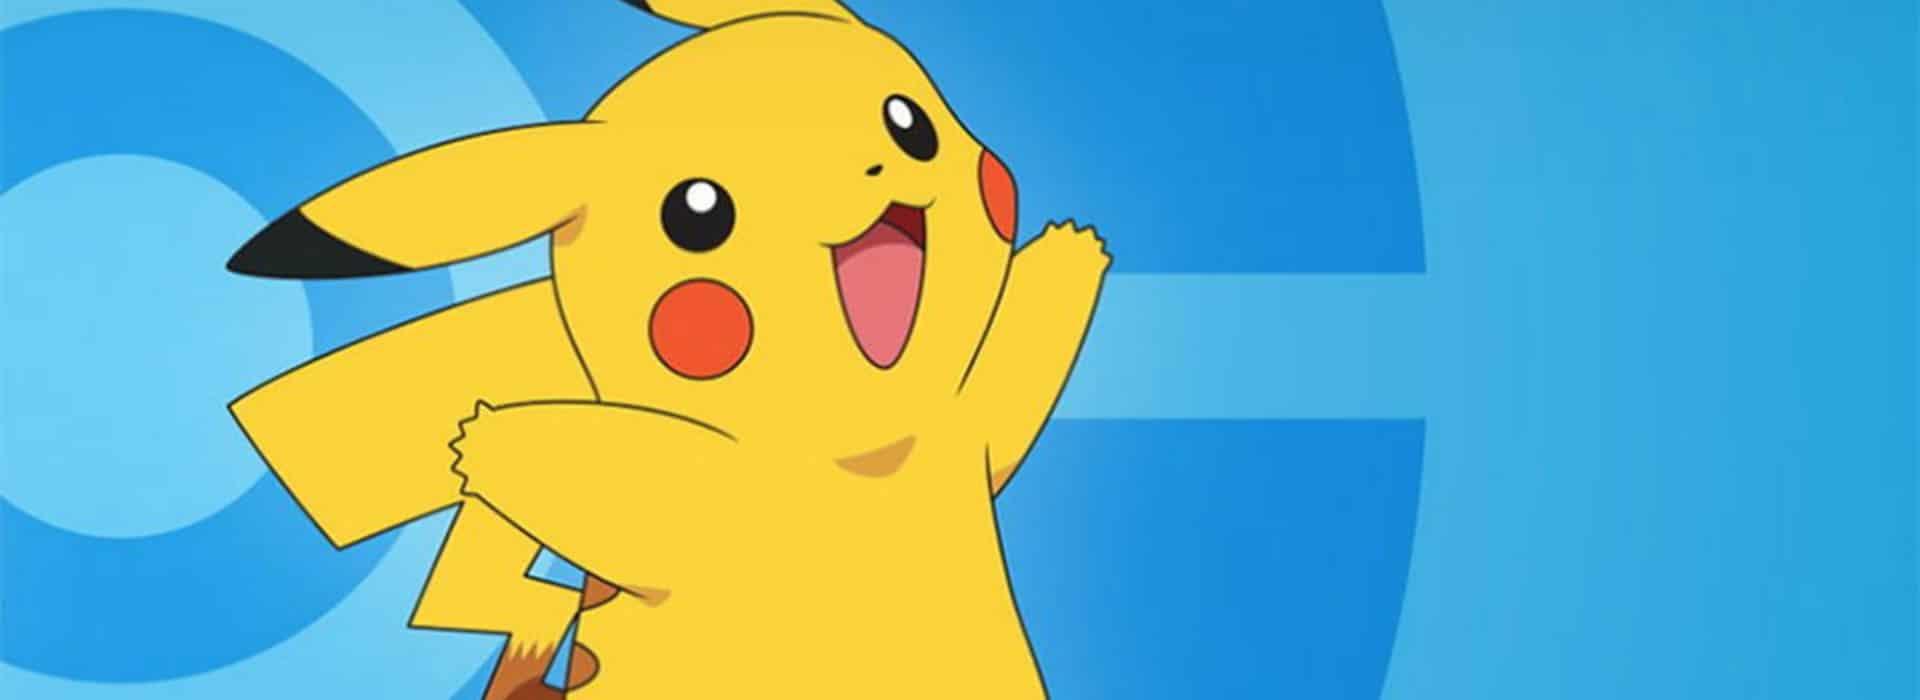 pikachu-banner